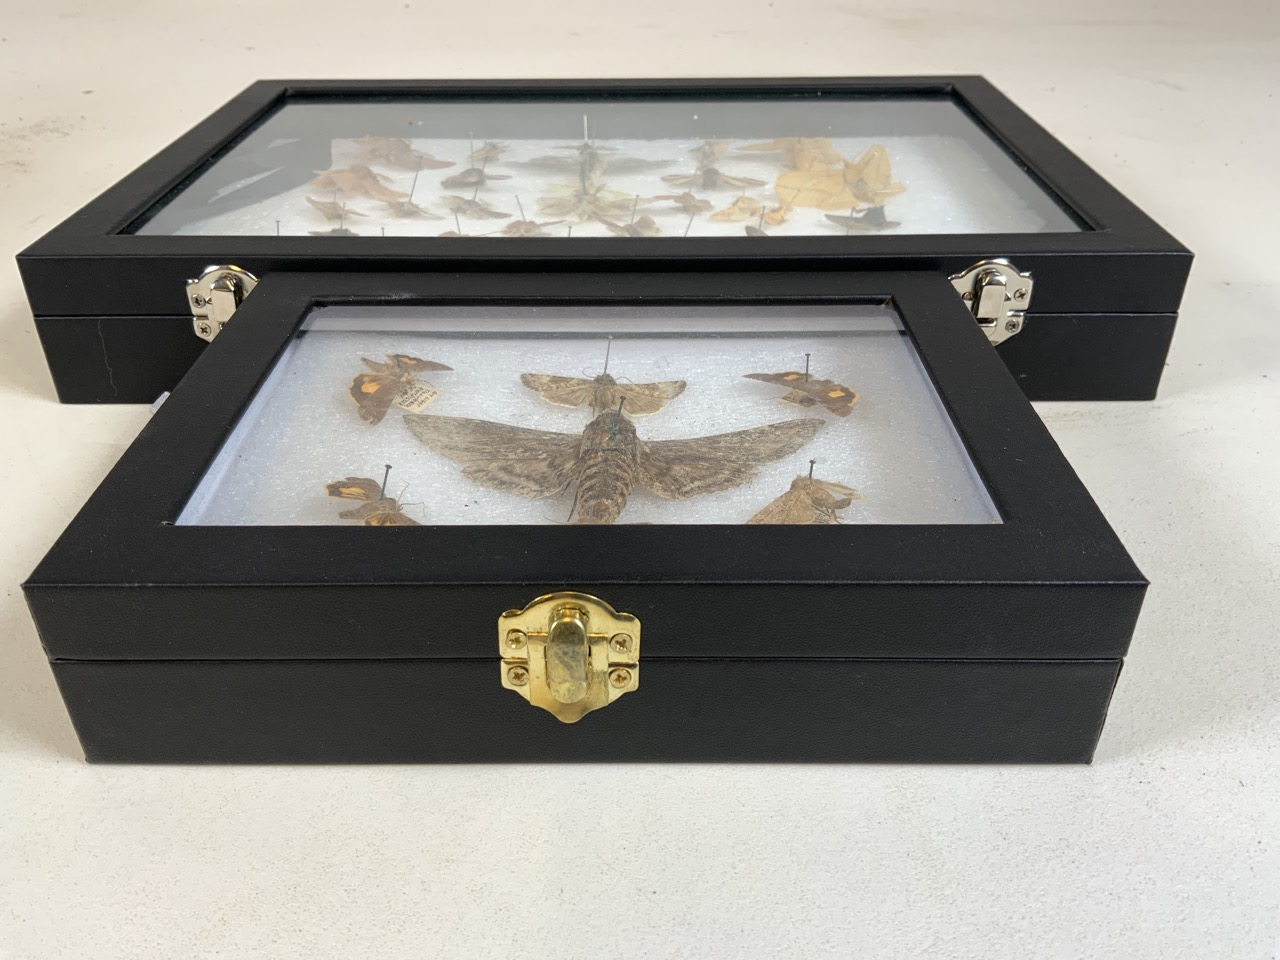 Two cases of Devon moths including a death head moth. W:24cm x D:35cm - Image 4 of 4